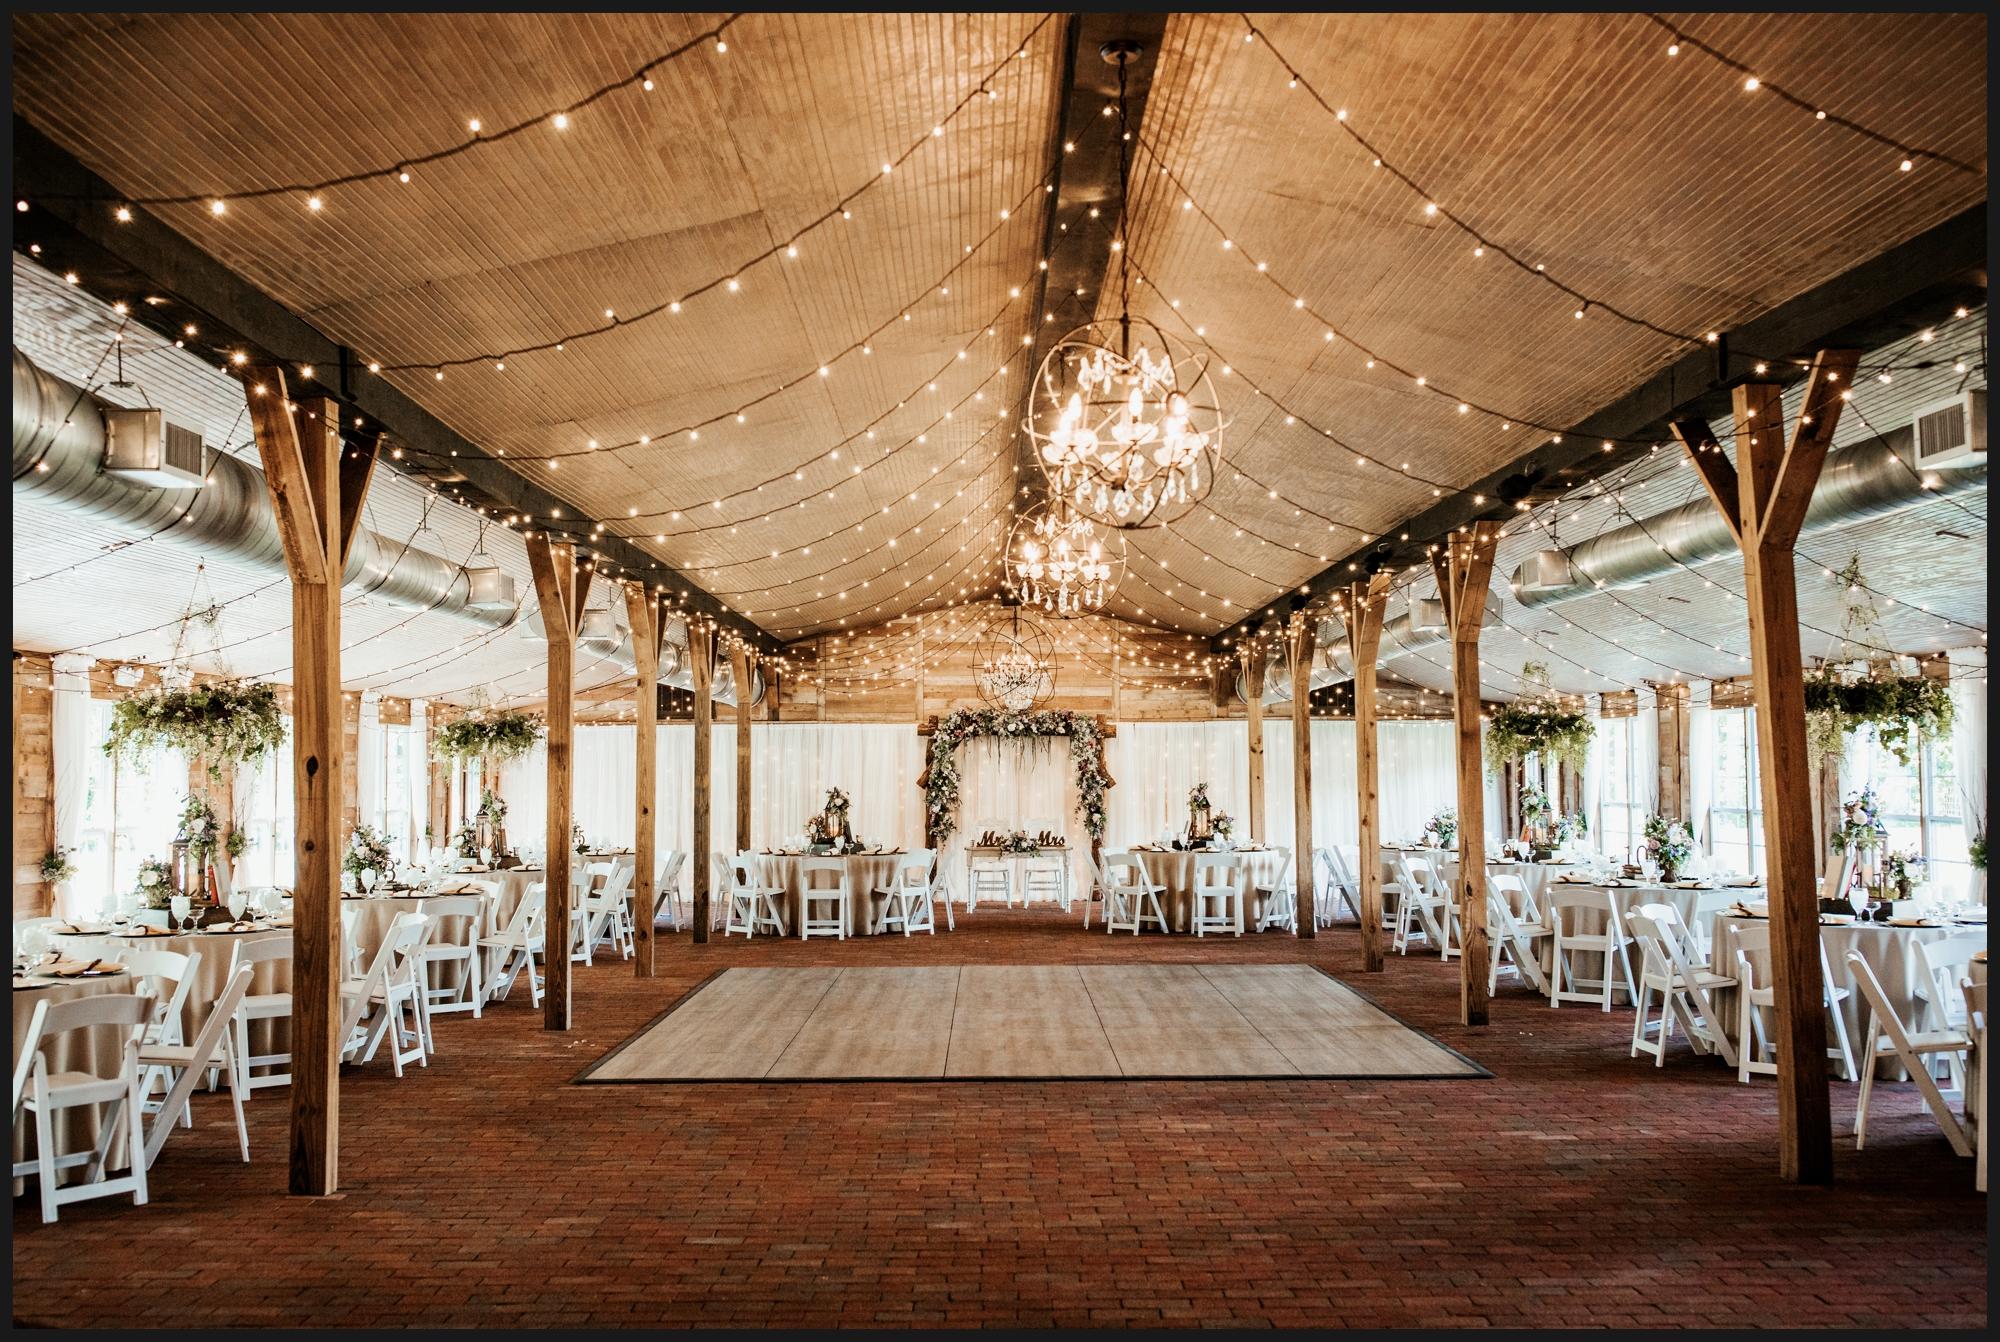 Orlando-Wedding-Photographer-destination-wedding-photographer-florida-wedding-photographer-bohemian-wedding-photographer_1629.jpg